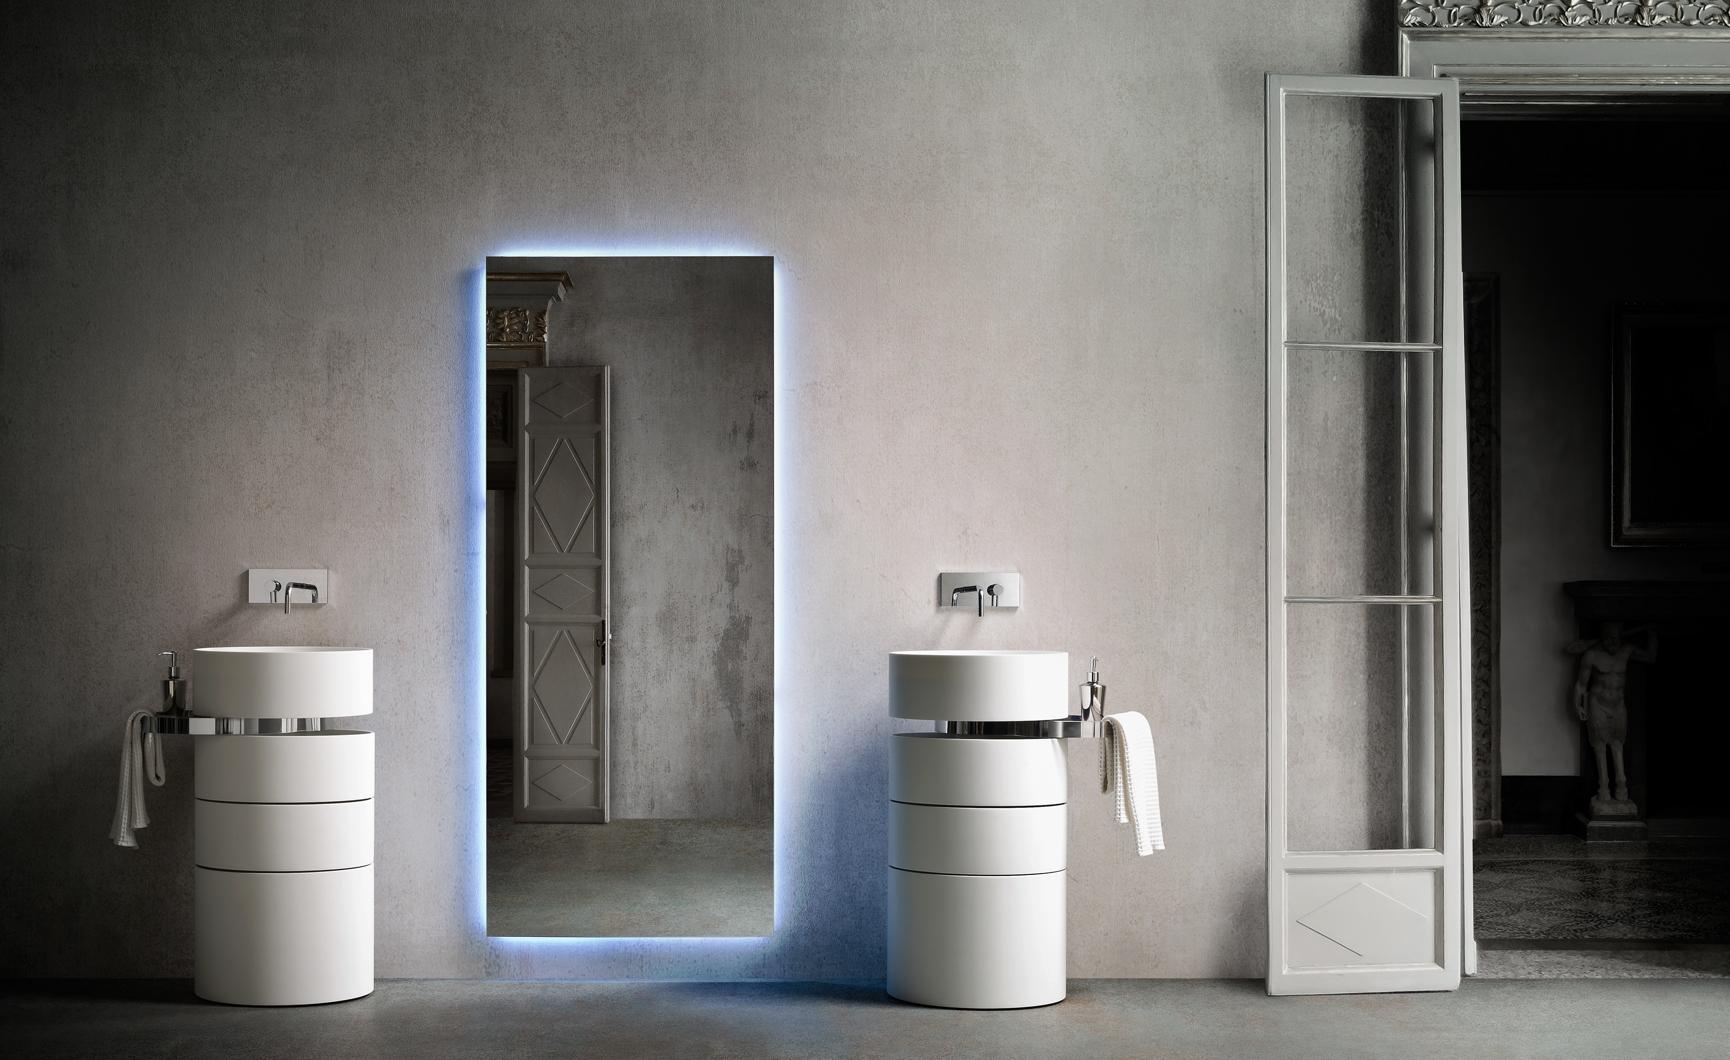 25 144404 geen wastafel in badkamer - Badkamer met wastafel ...